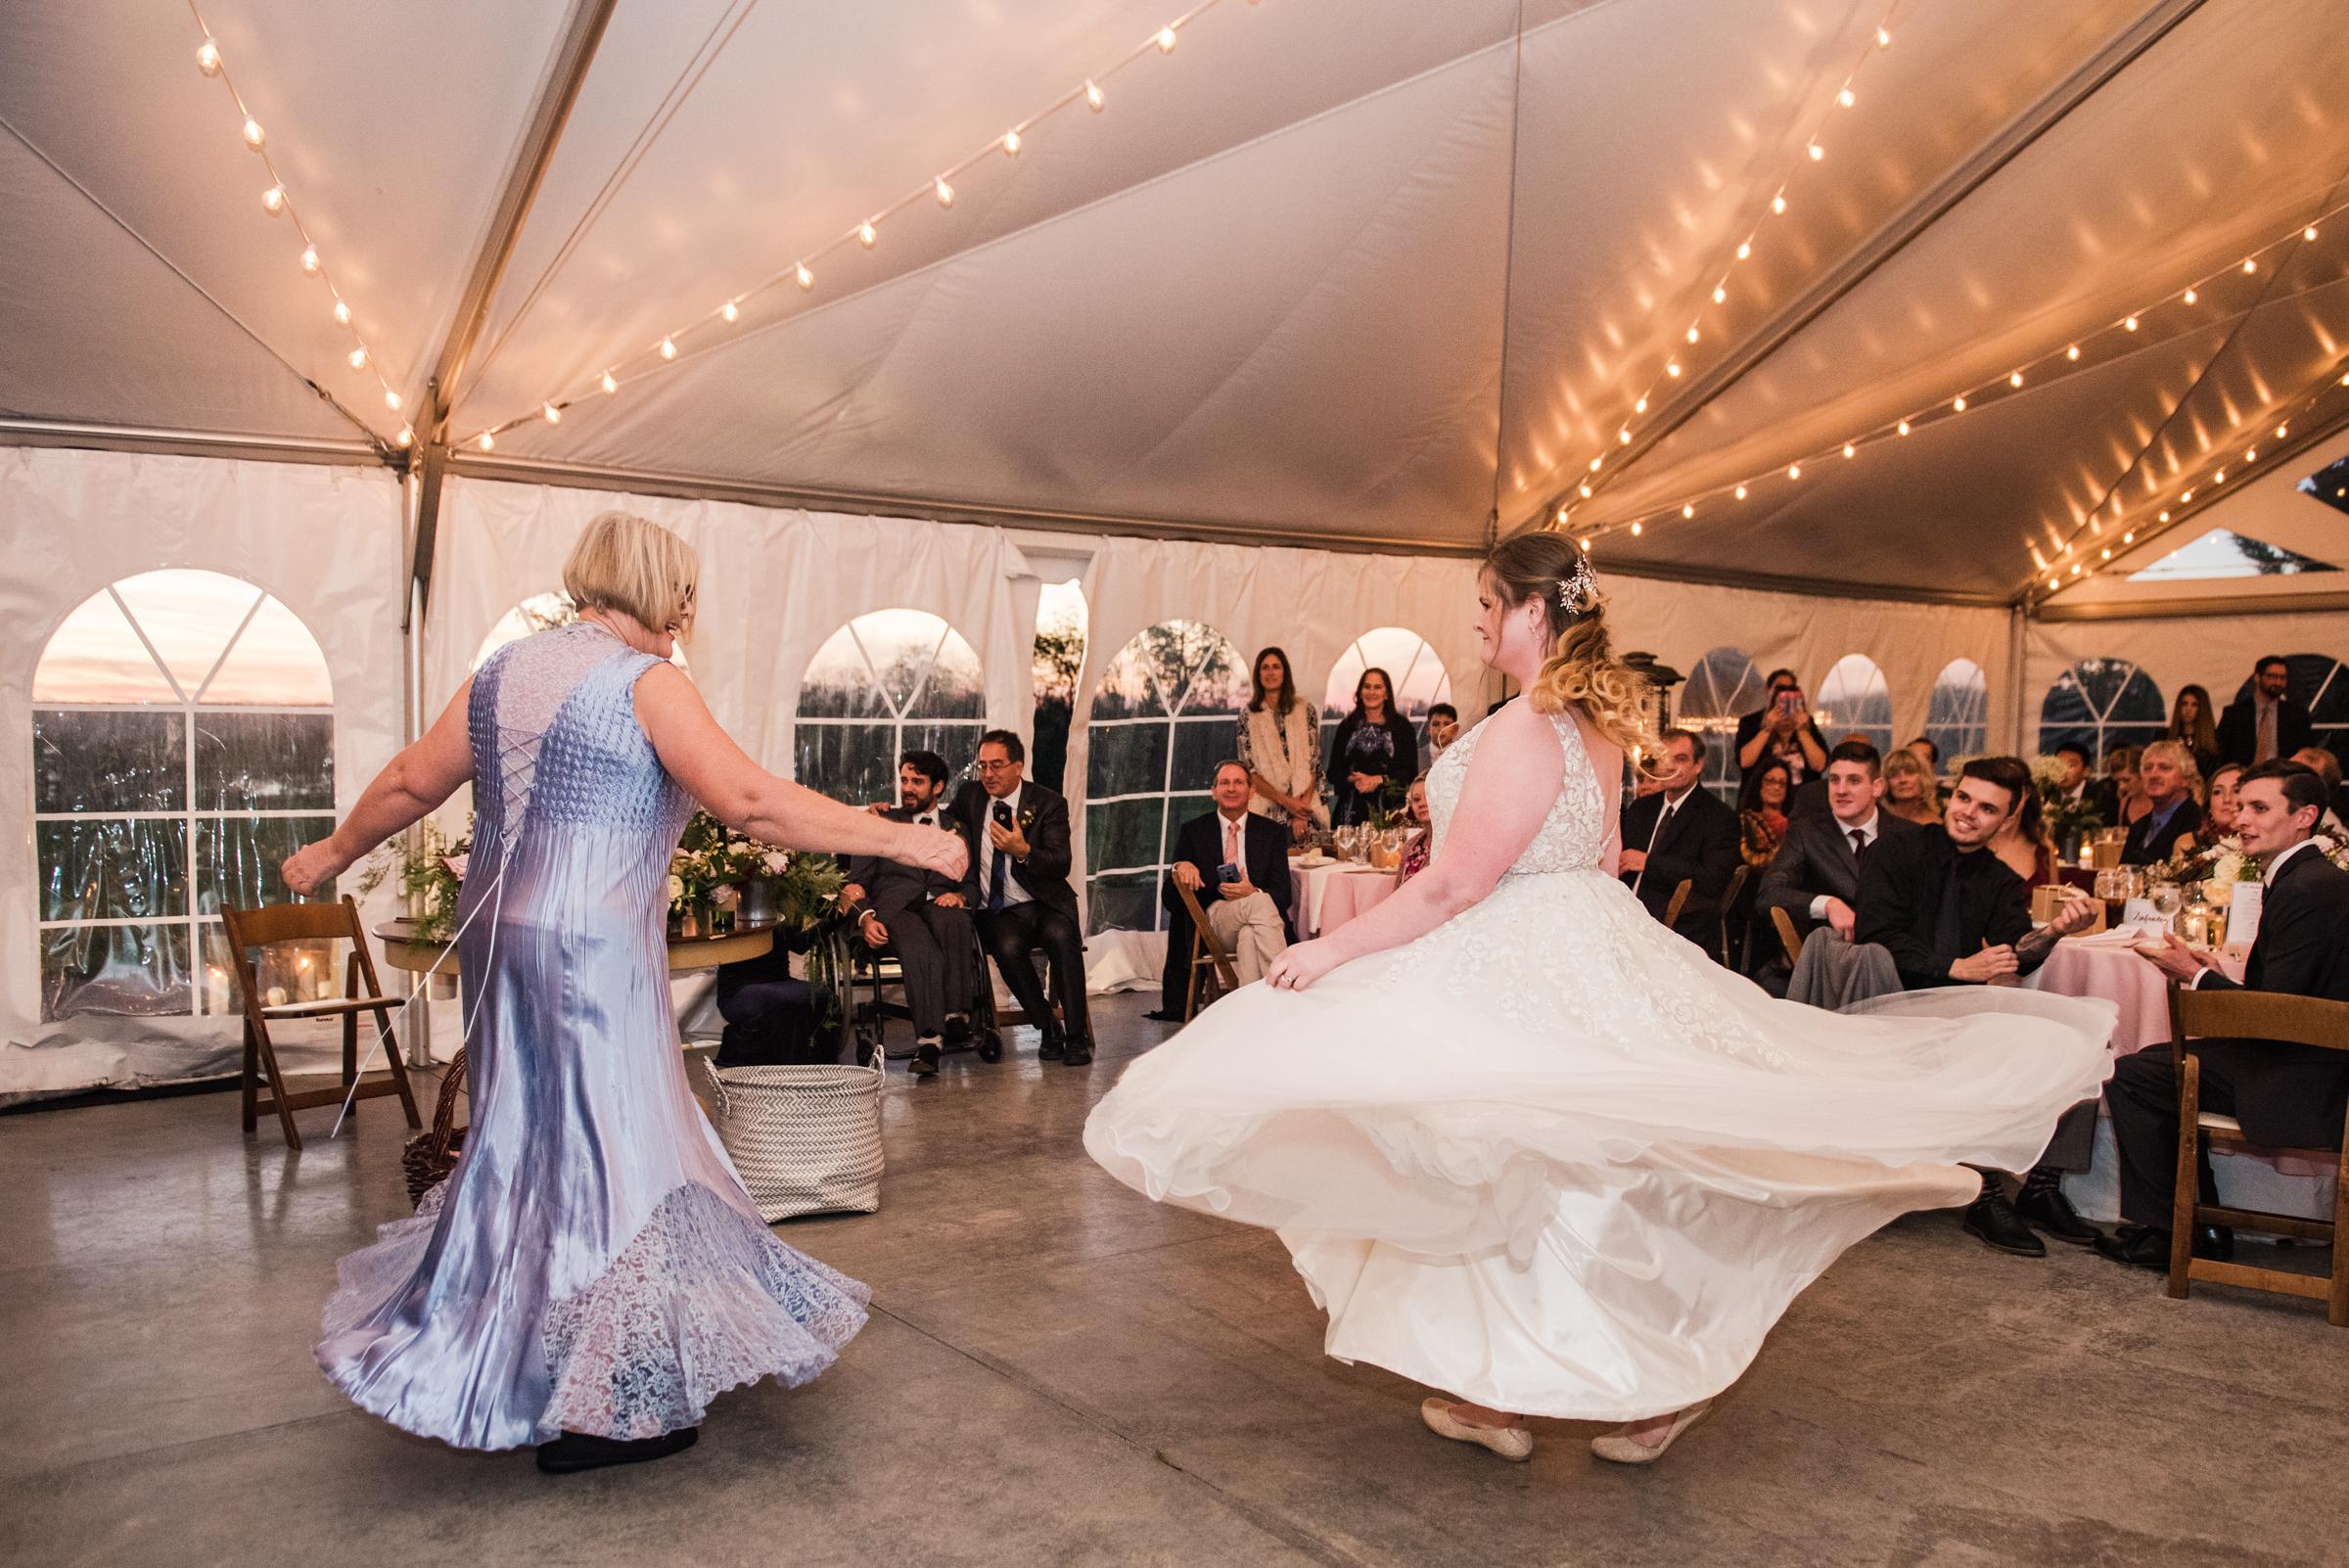 Zugibe_Vineyards_Finger_Lakes_Wedding_JILL_STUDIO_Rochester_NY_Photographer_DSC_4326.jpg